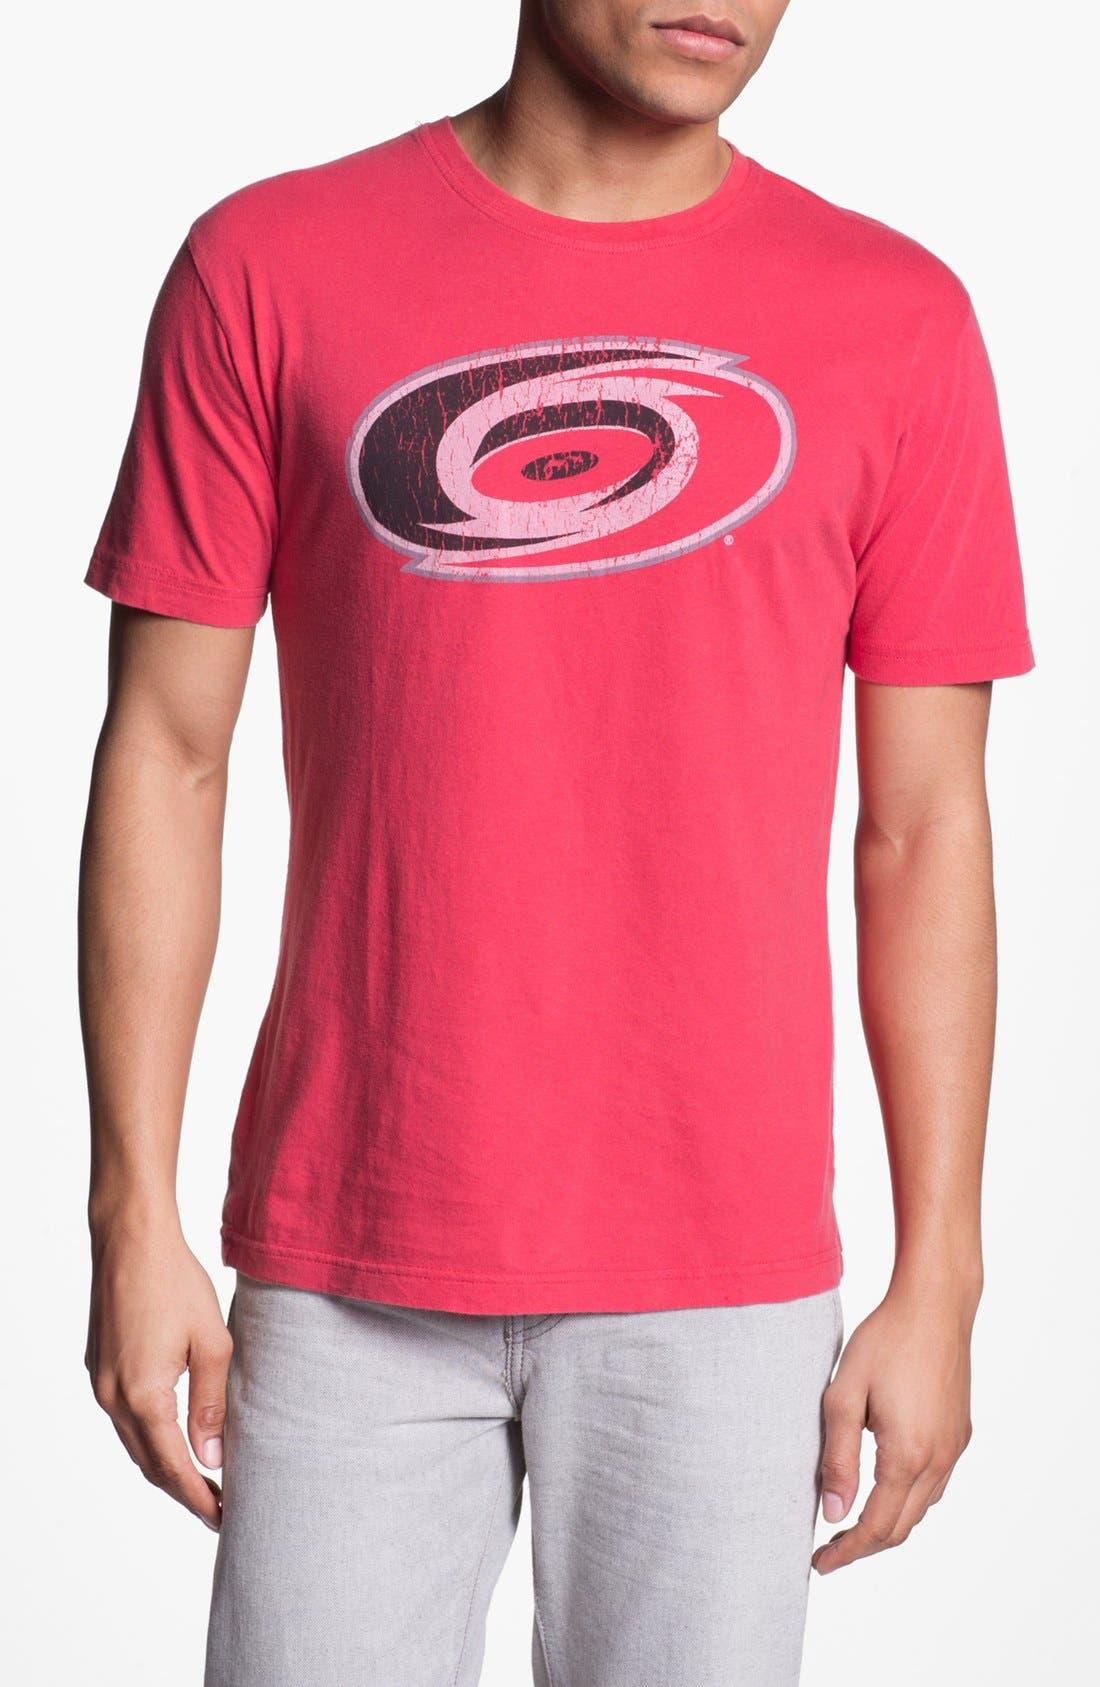 Main Image - Red Jacket 'Hurricanes - Brass Tack' T-Shirt